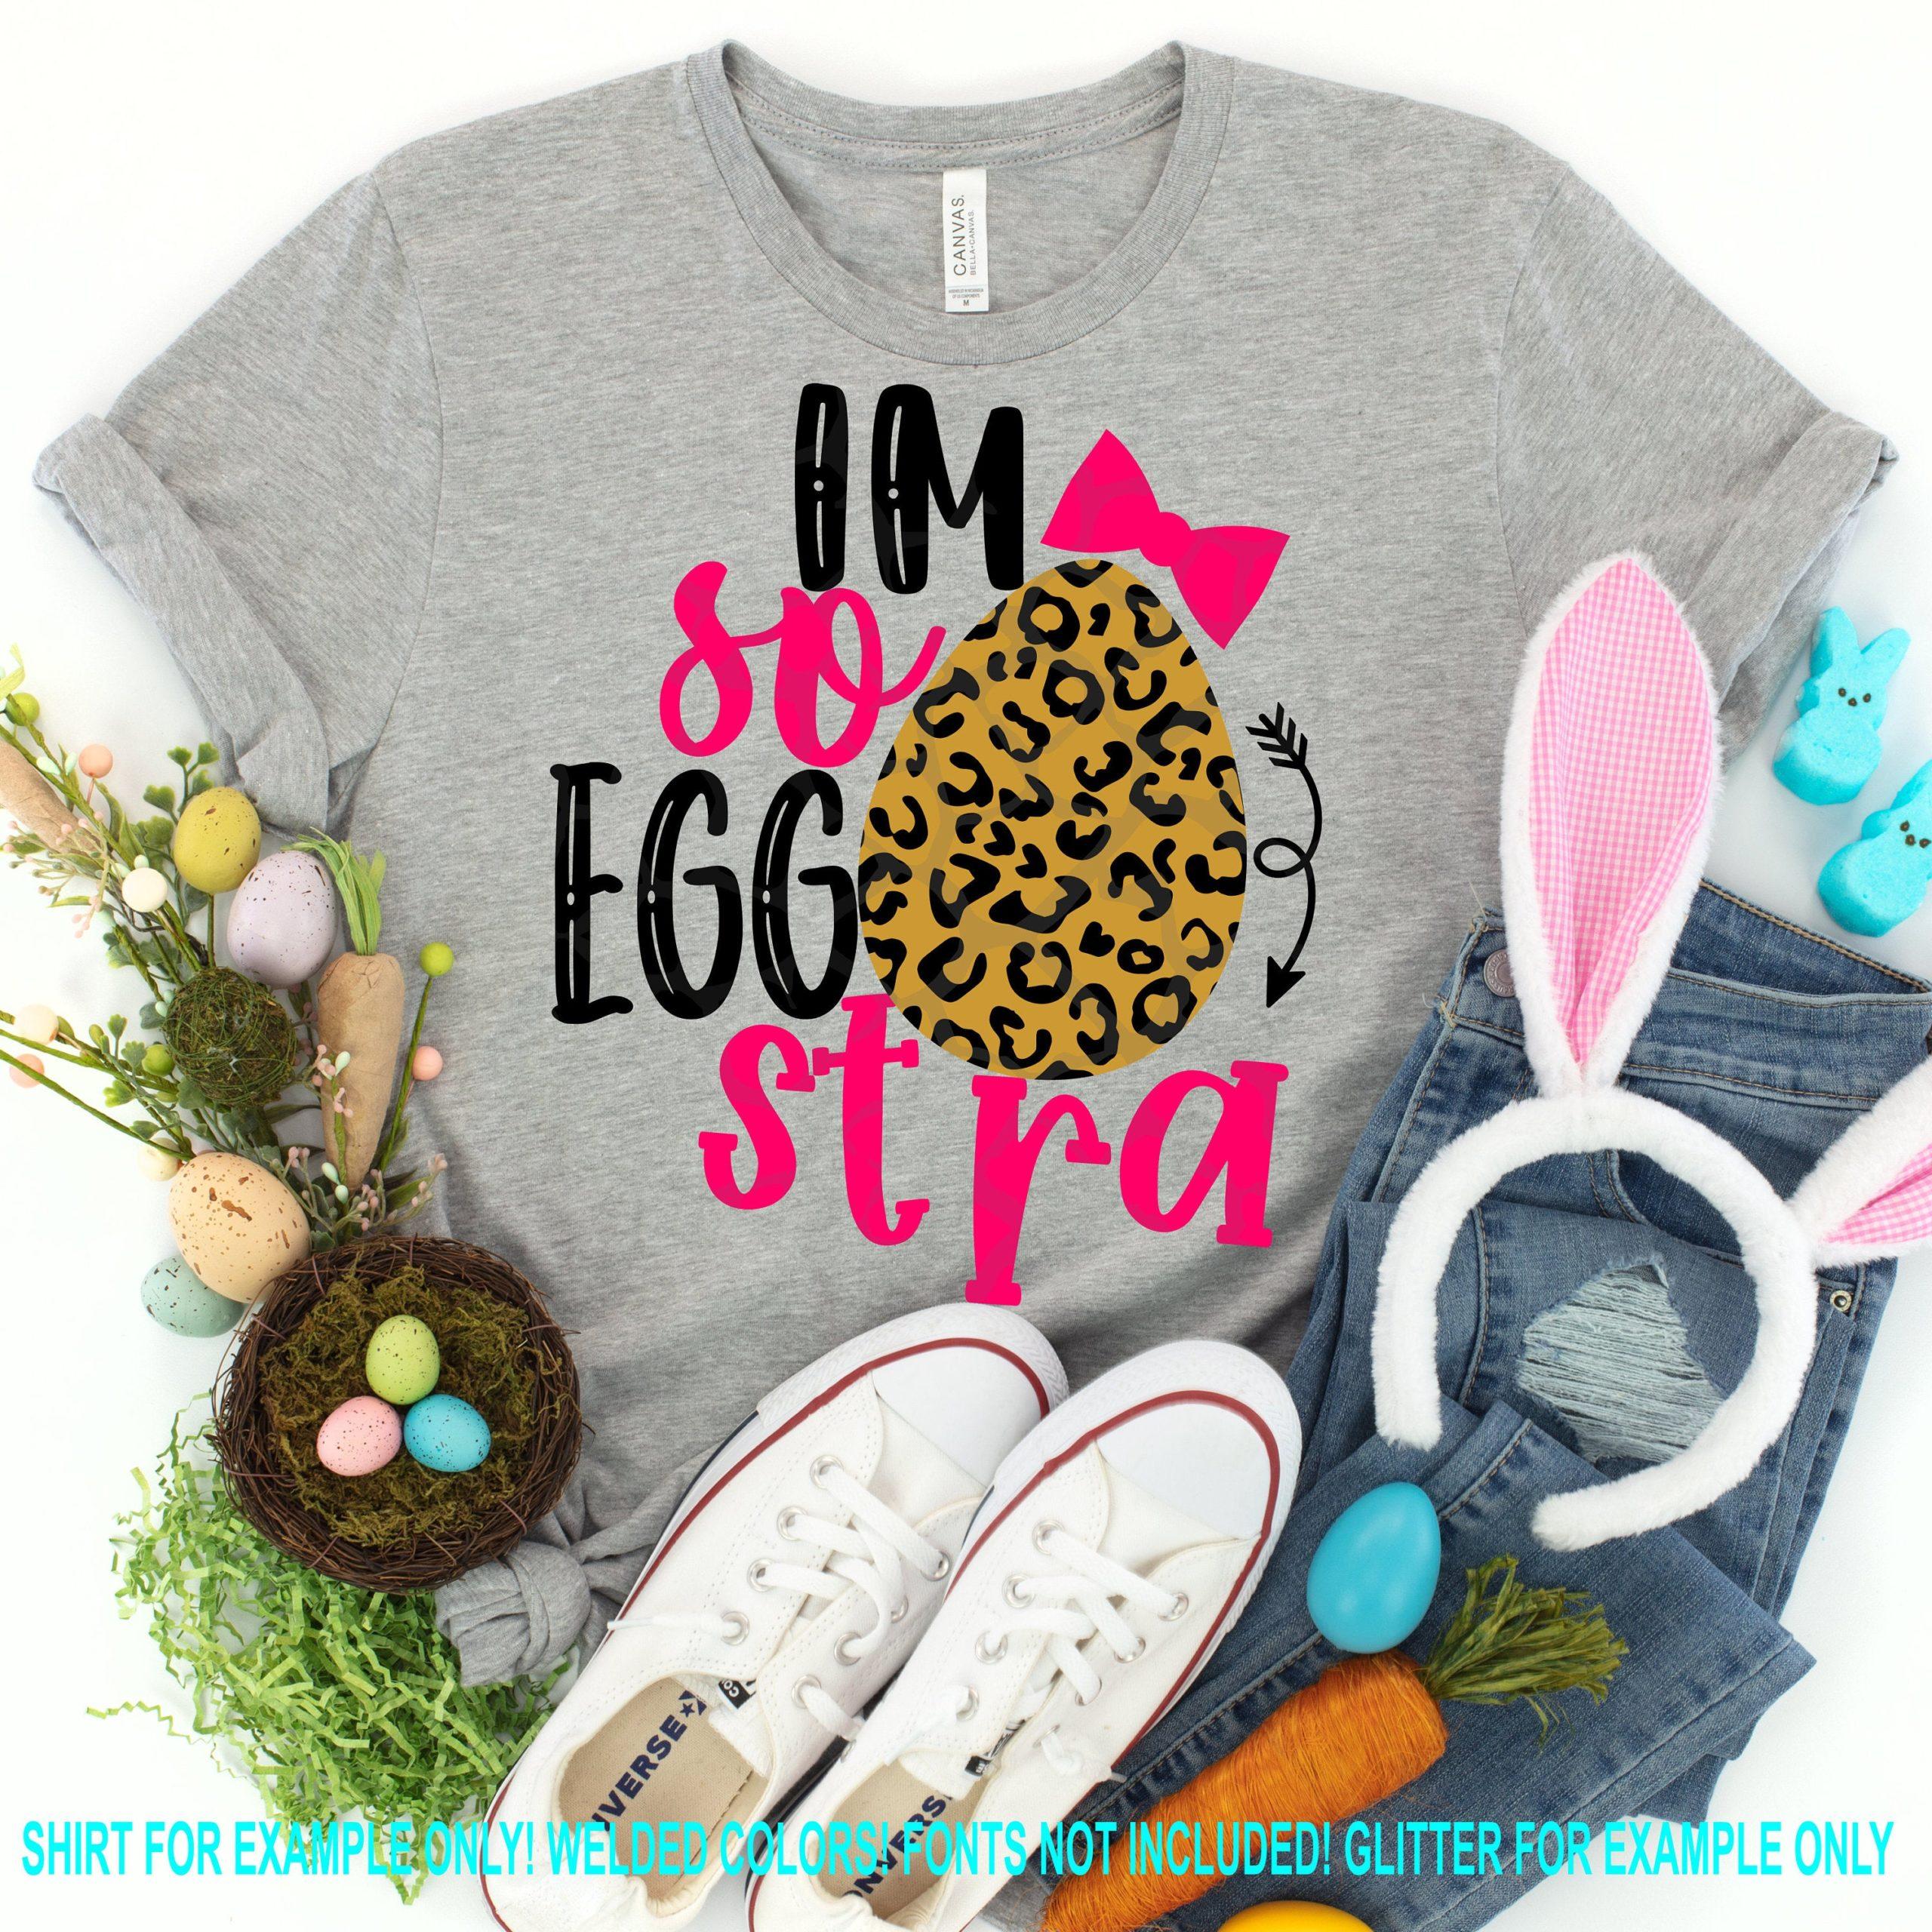 Easter-svg-im-so-eggstra-svg-so-extra-svg-religious-svg-jesus-svg-easter-svg-design-easter-cut-file-easter-cricut-svg-cricut-svg-60513b9e